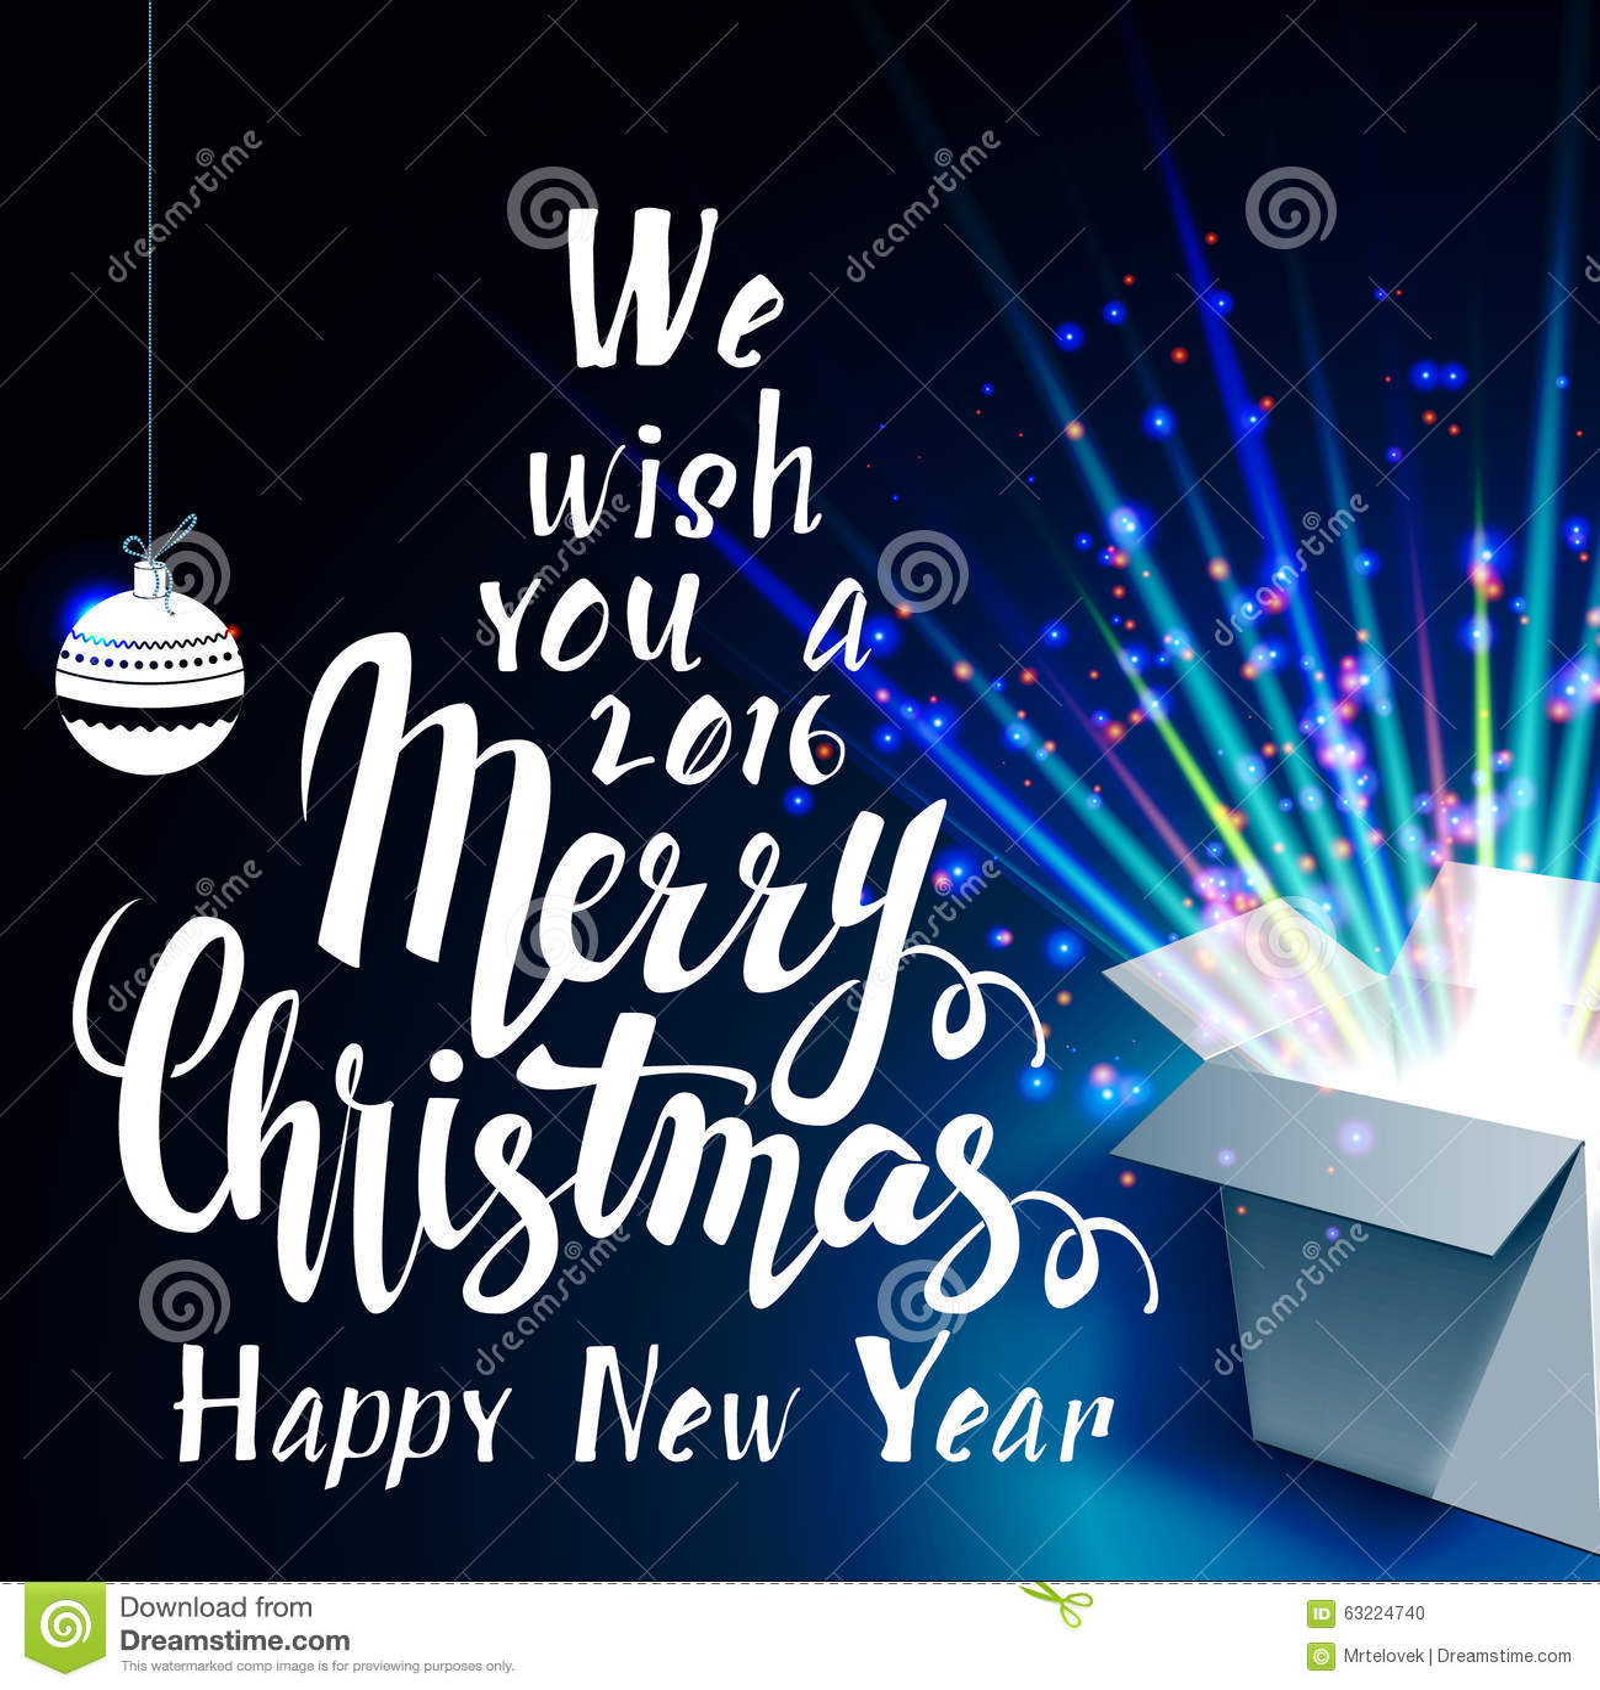 wish you merry christmas piano